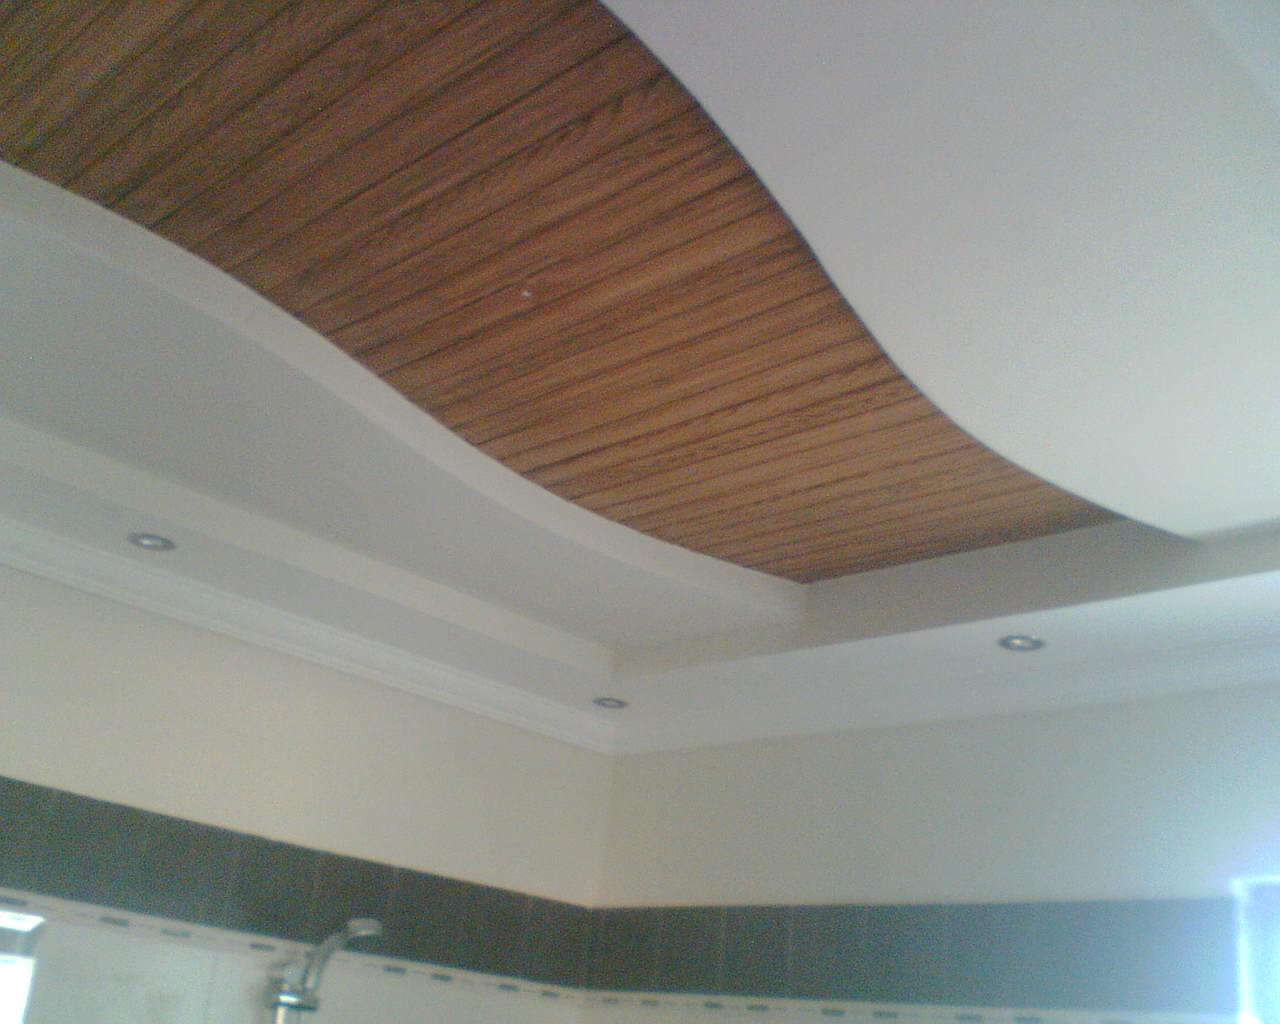 Plaster Of Paris Ceiling Designs For Living Room Complaster Of Paris Wall Designs Home Design Ideas